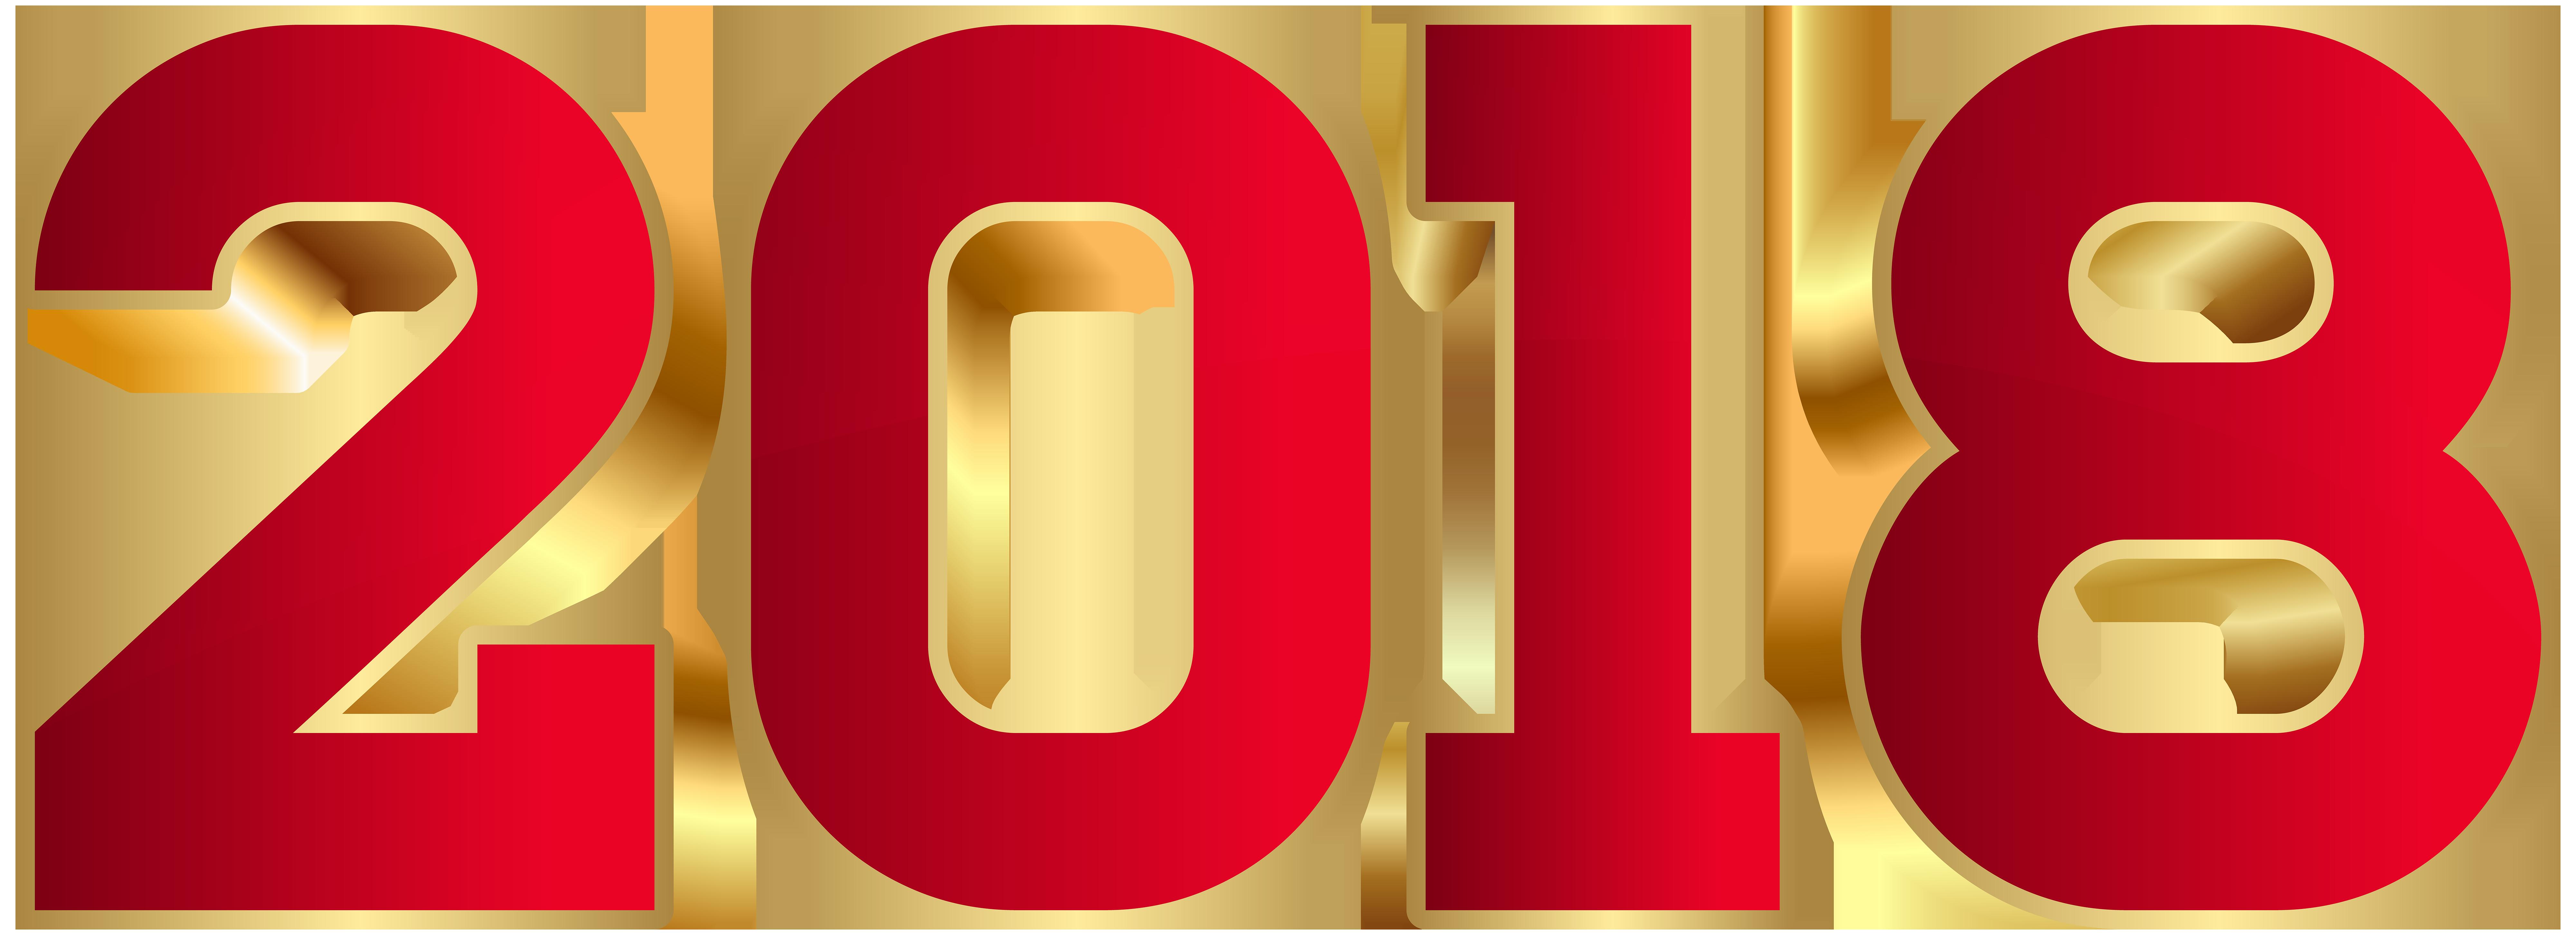 2018 Red Transparent PNG Clip Art.